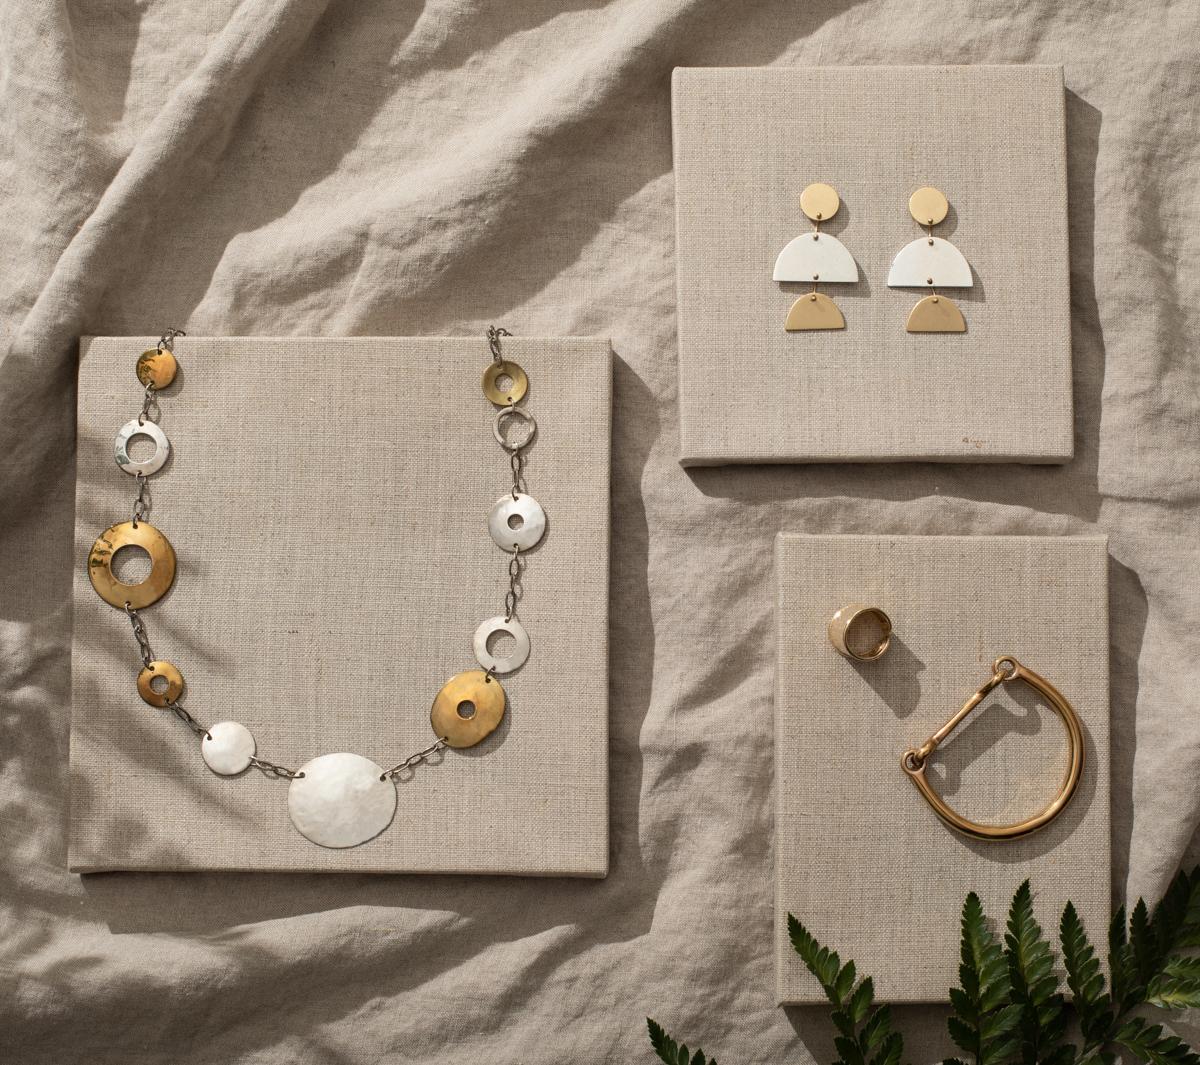 Jewelry-linen-hard-light-product-stylist-jesica-kurashima.jpg